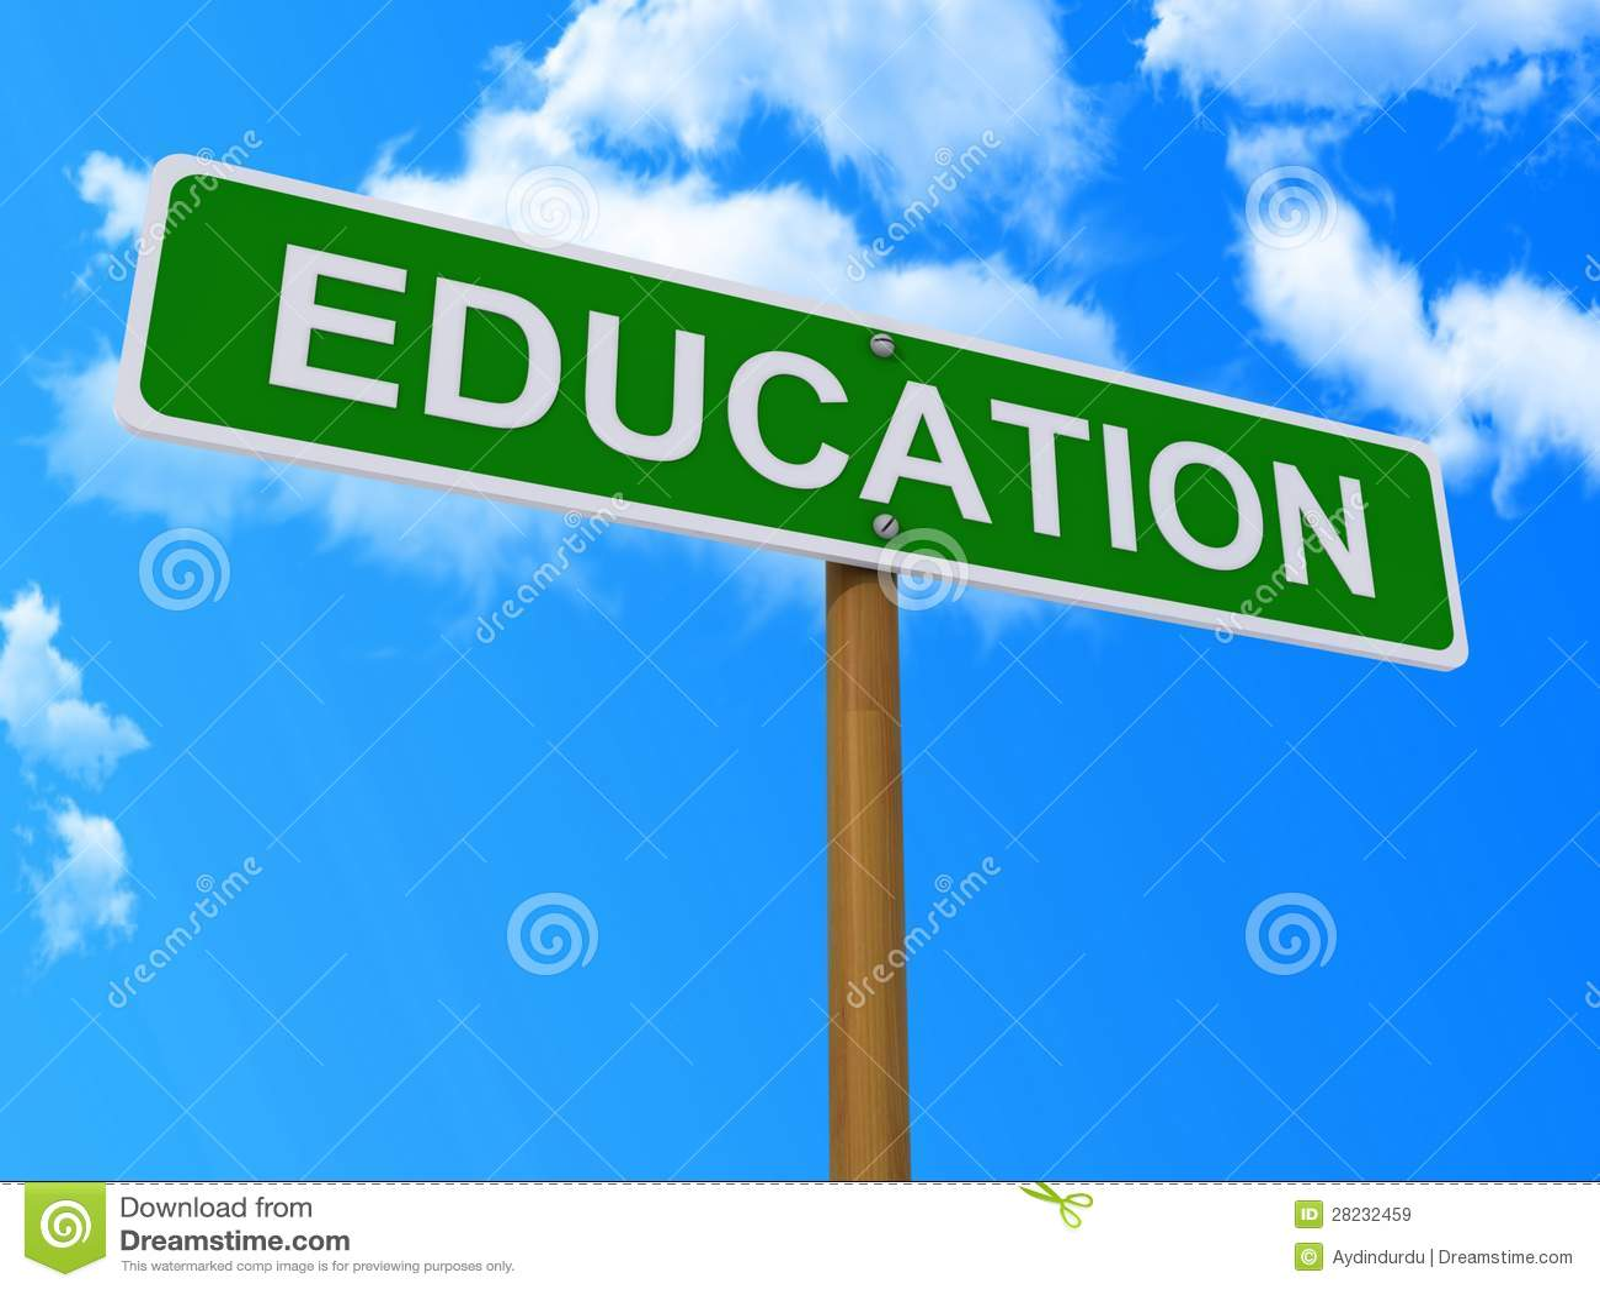 education-sign-28232459.jpg